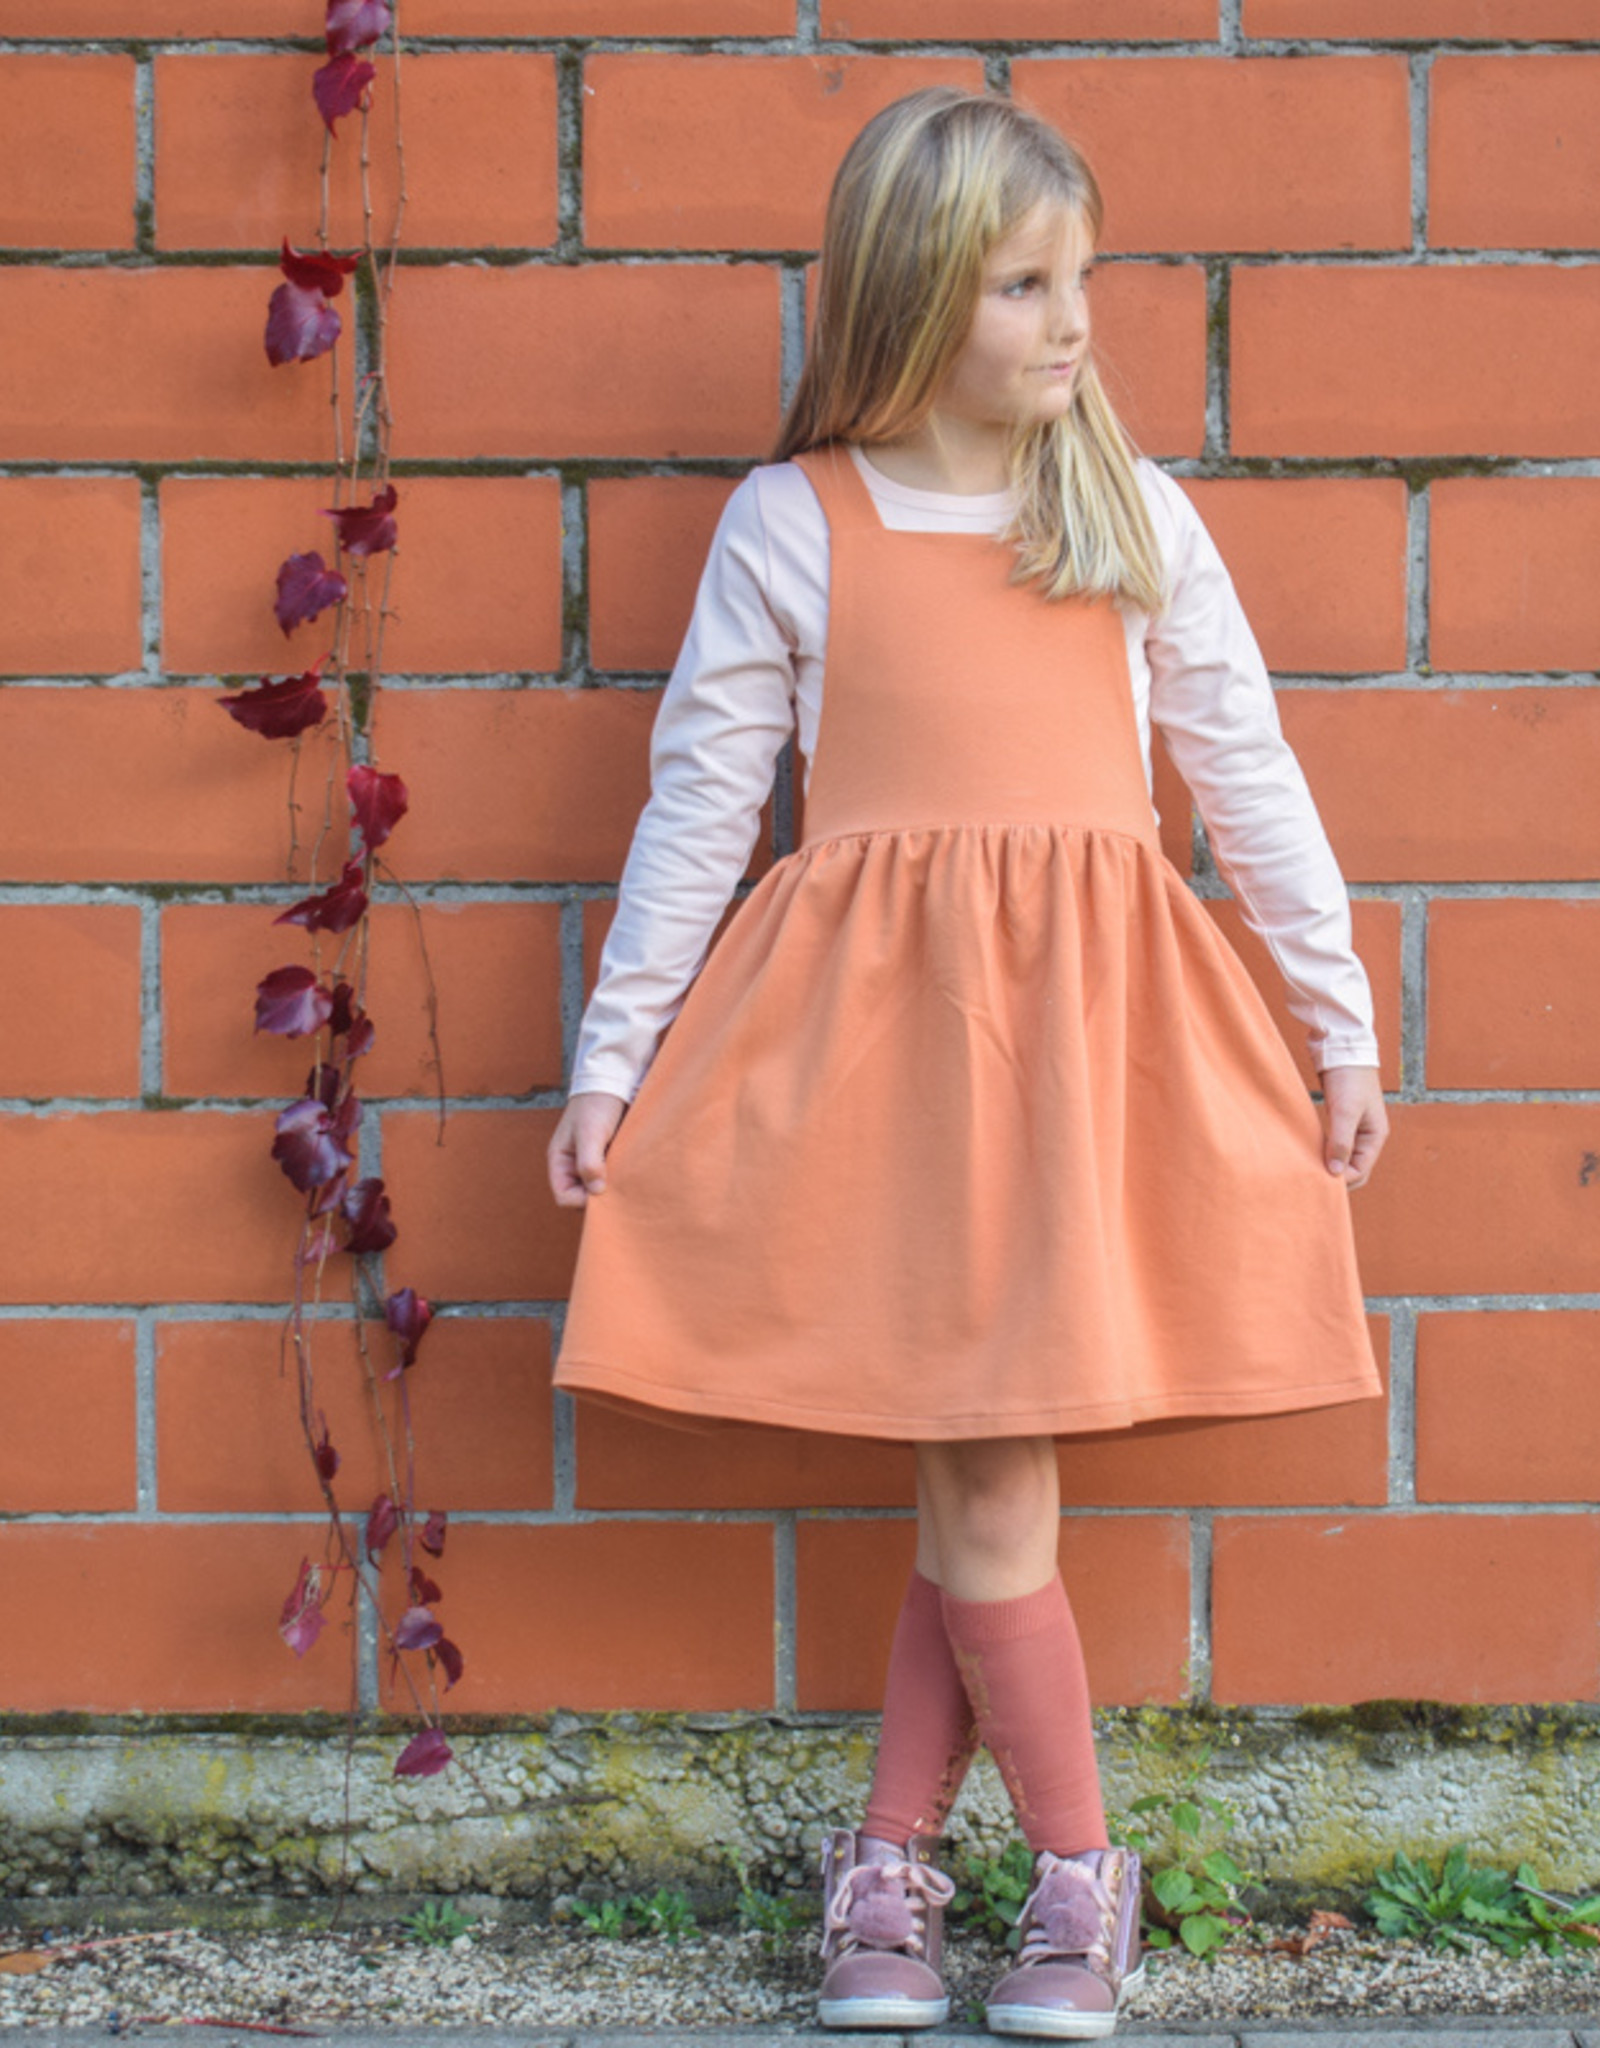 Bel' Etoile Willa jurk en jumpsuit naaipatroon